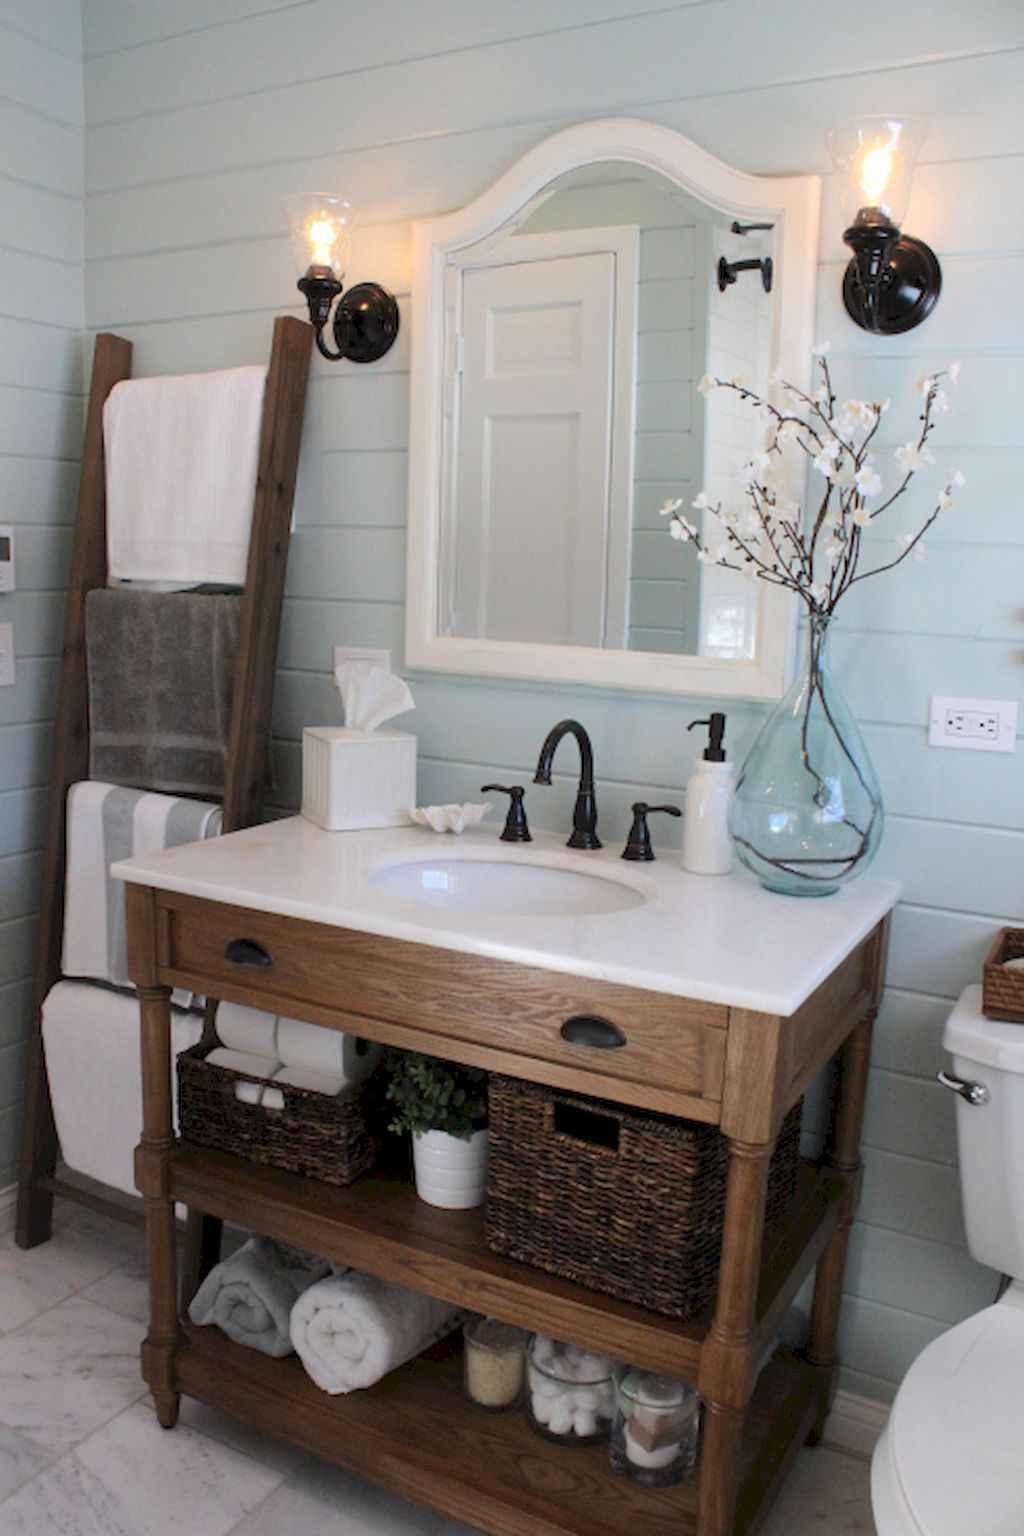 Inspiring apartment bathroom remodel ideas on a budget (26)